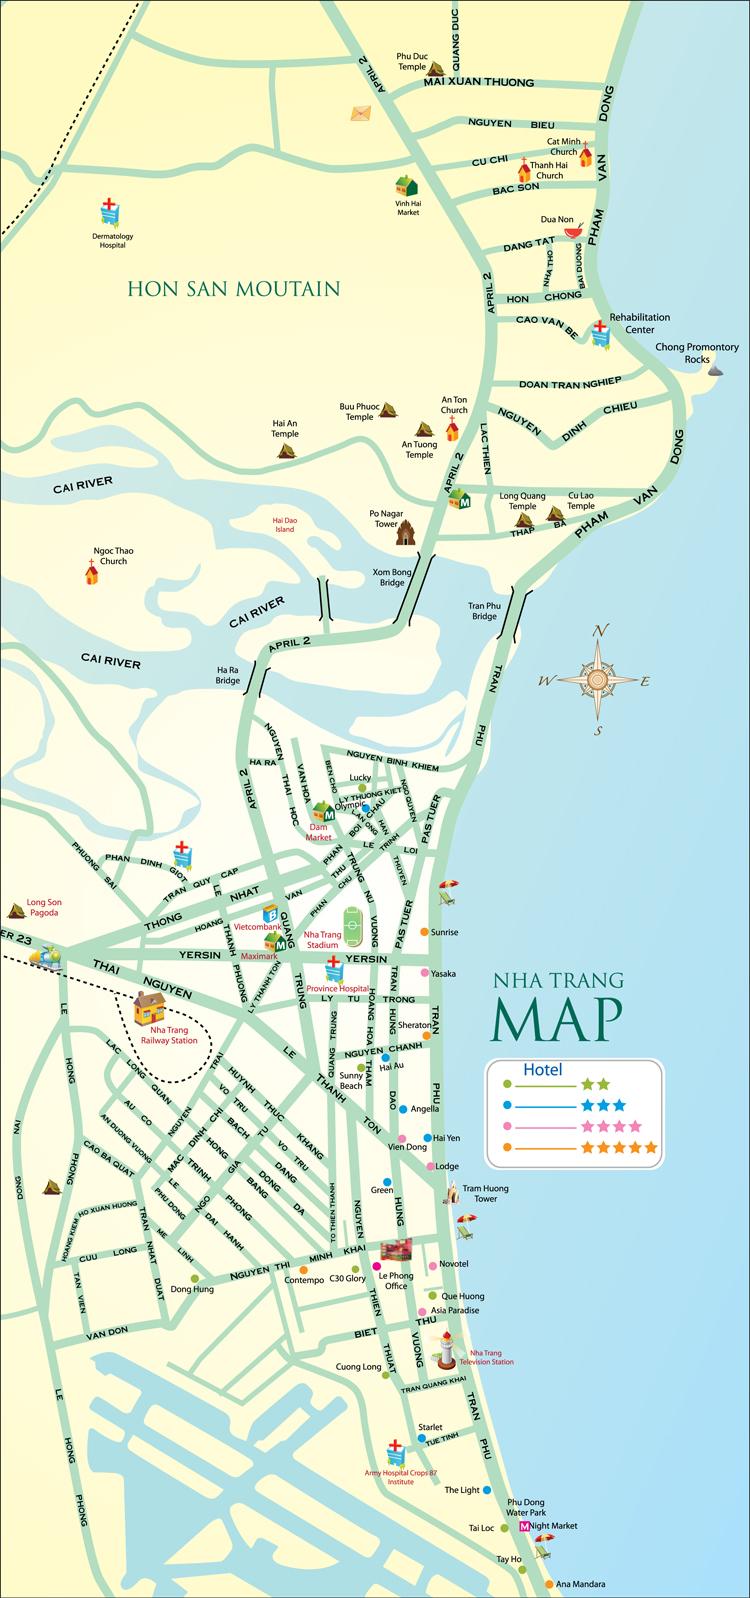 Карта нячанга вьетнам на русском языке